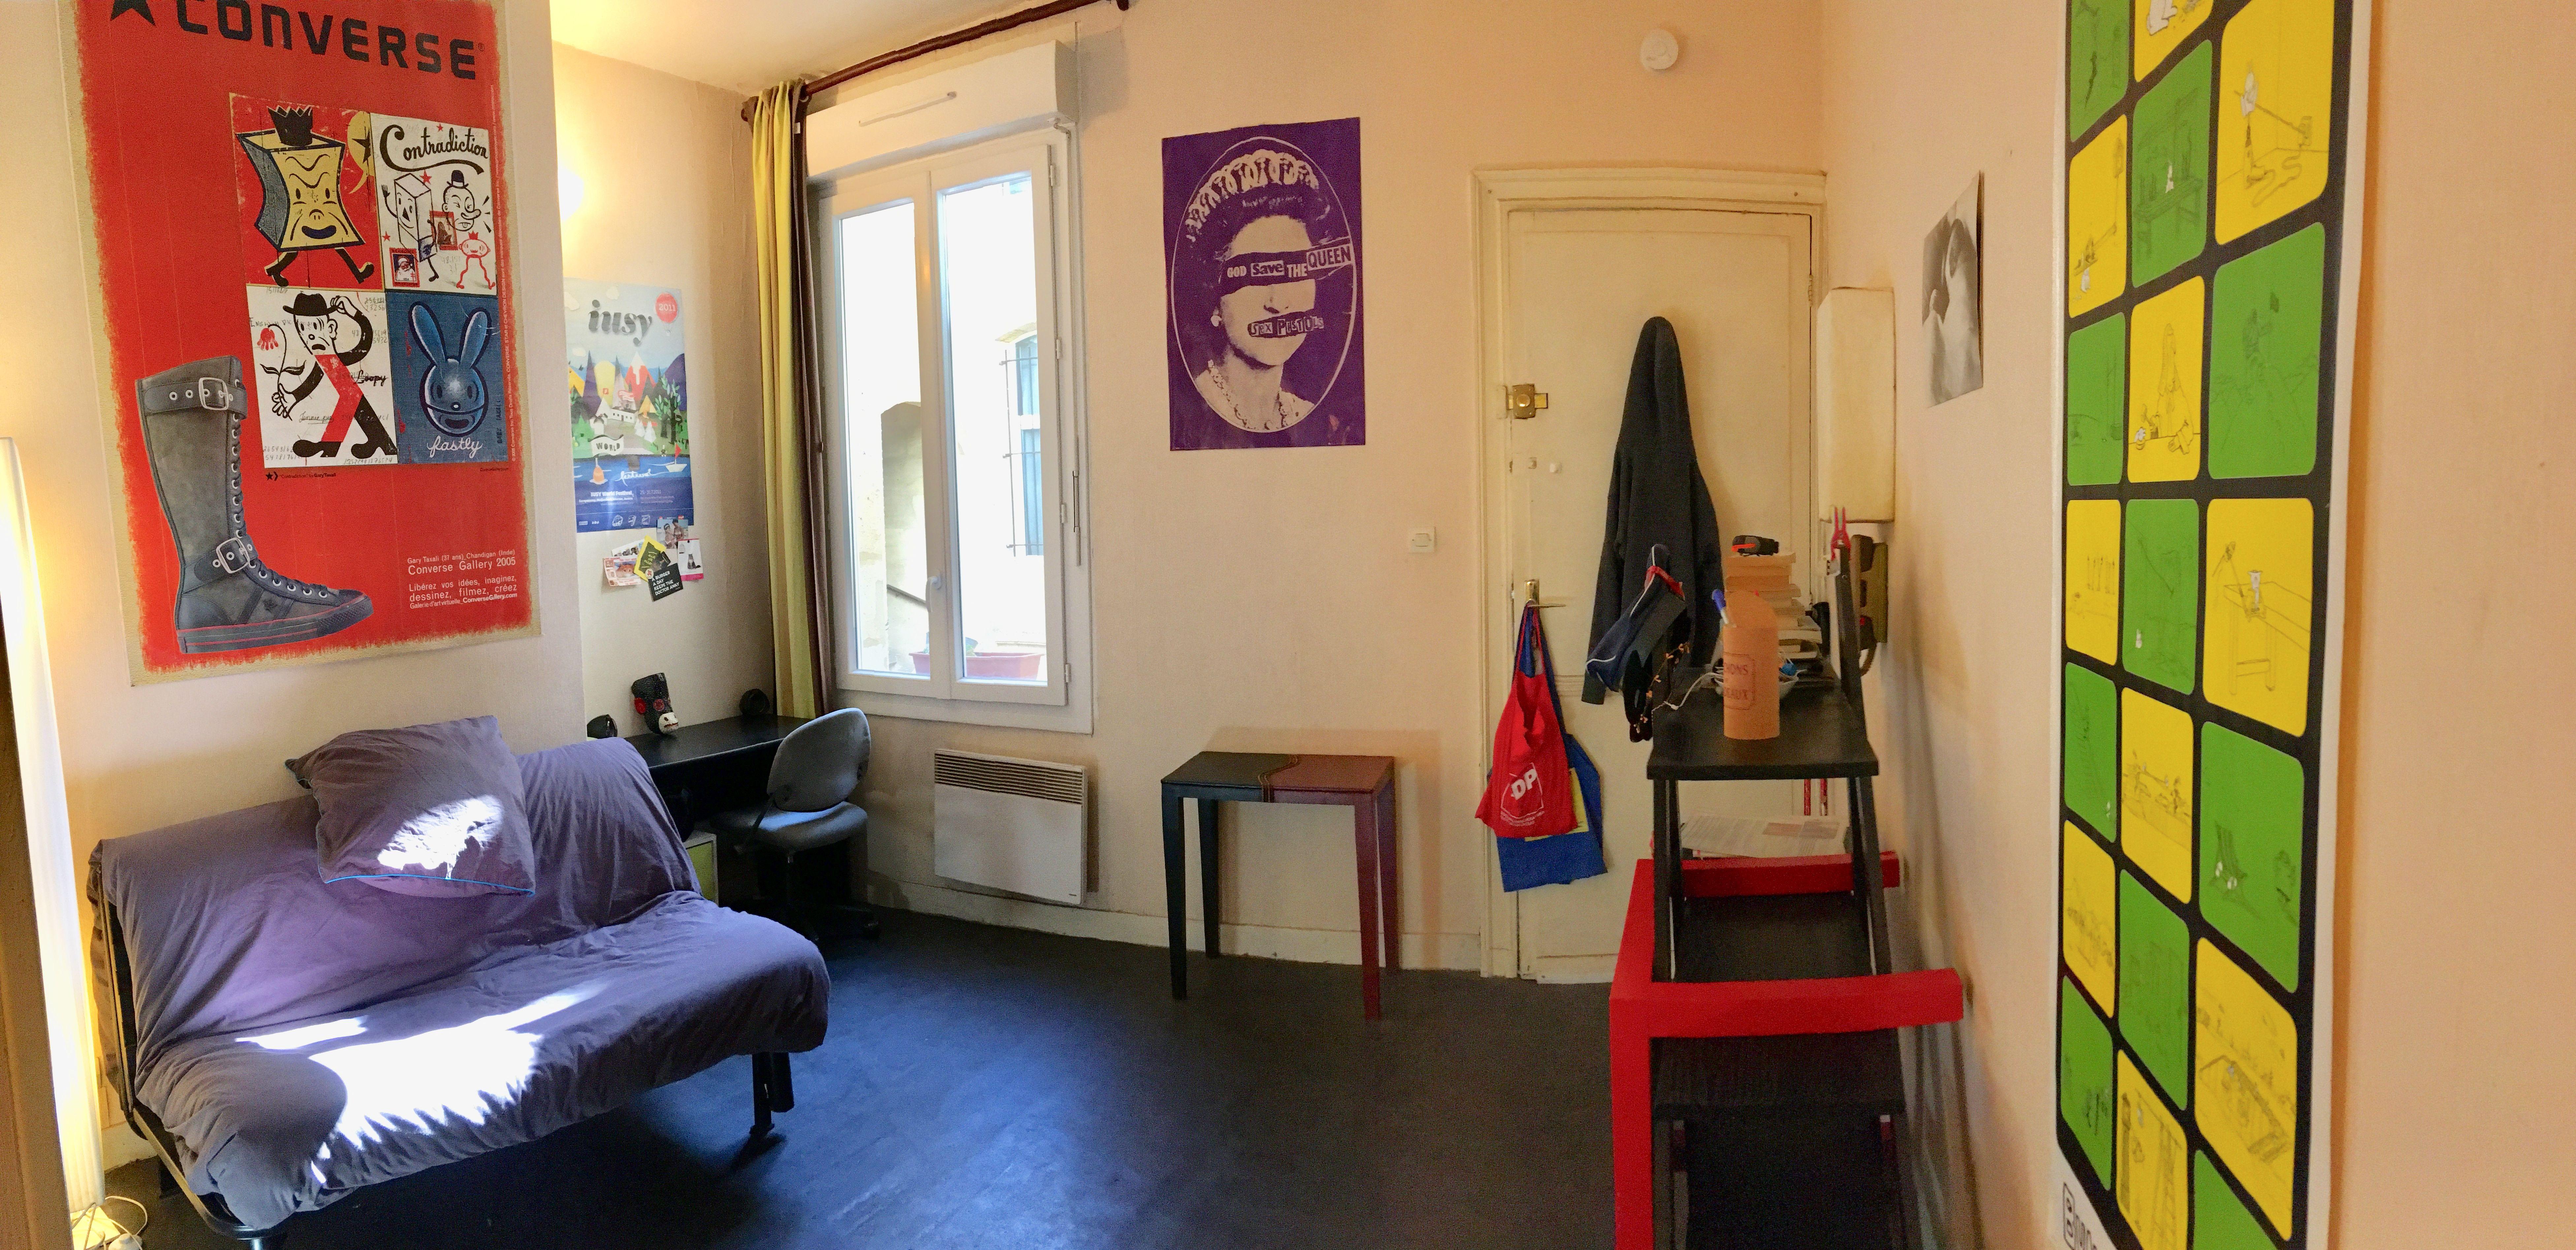 Colocation Bordeaux HOMOSEXUELLE & Location Chambre à louer Bordeaux HOMOSEXUELLE | Loue chambre meublée Bordeaux HOMOSEXUELLE | Logement Bordeaux HOMOSEXUELLE